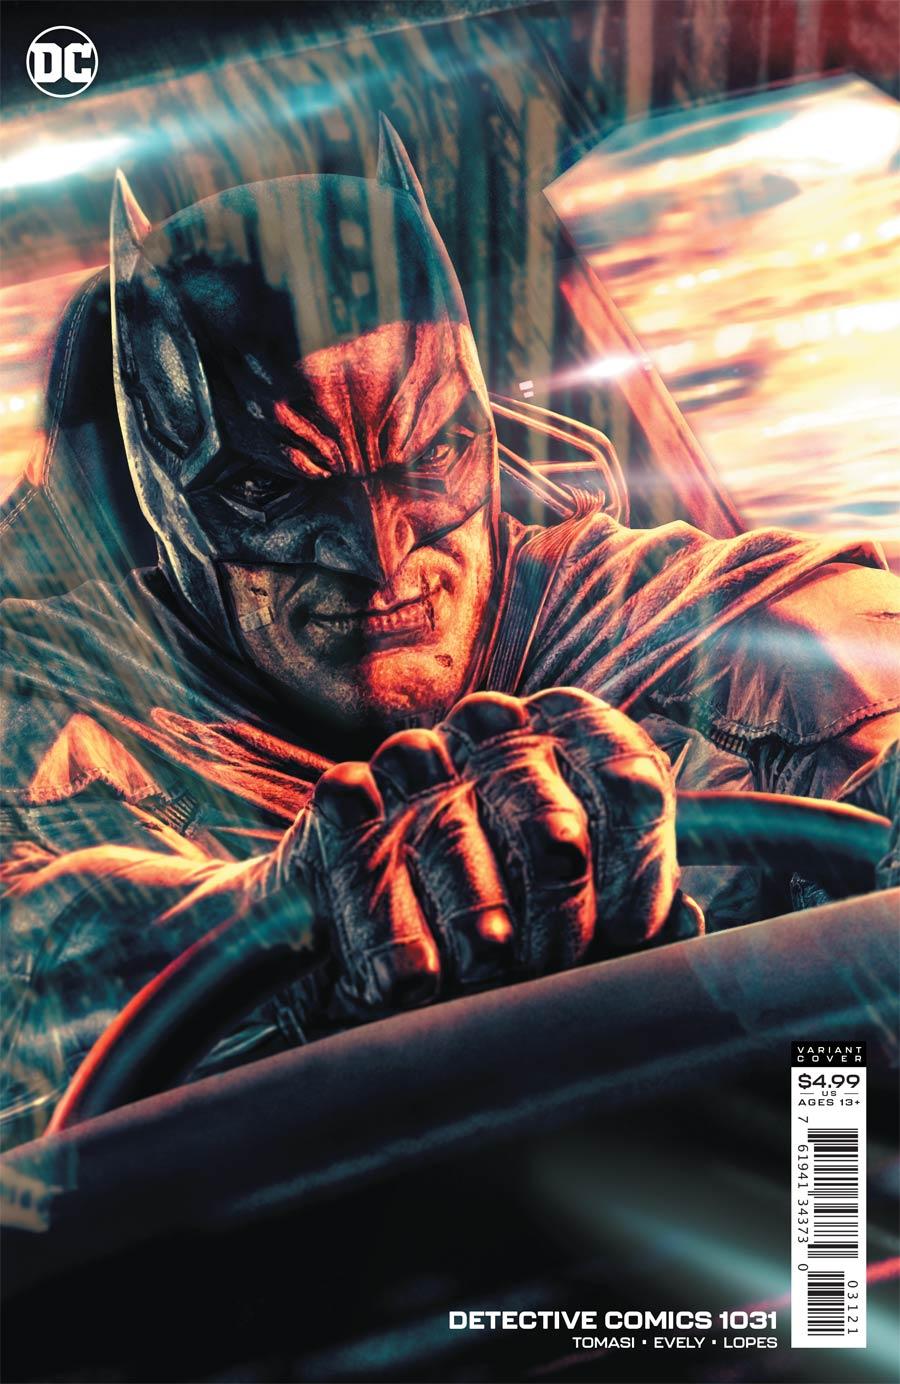 Detective Comics Vol 2 #1031 Cover B Variant Lee Bermejo Card Stock Cover